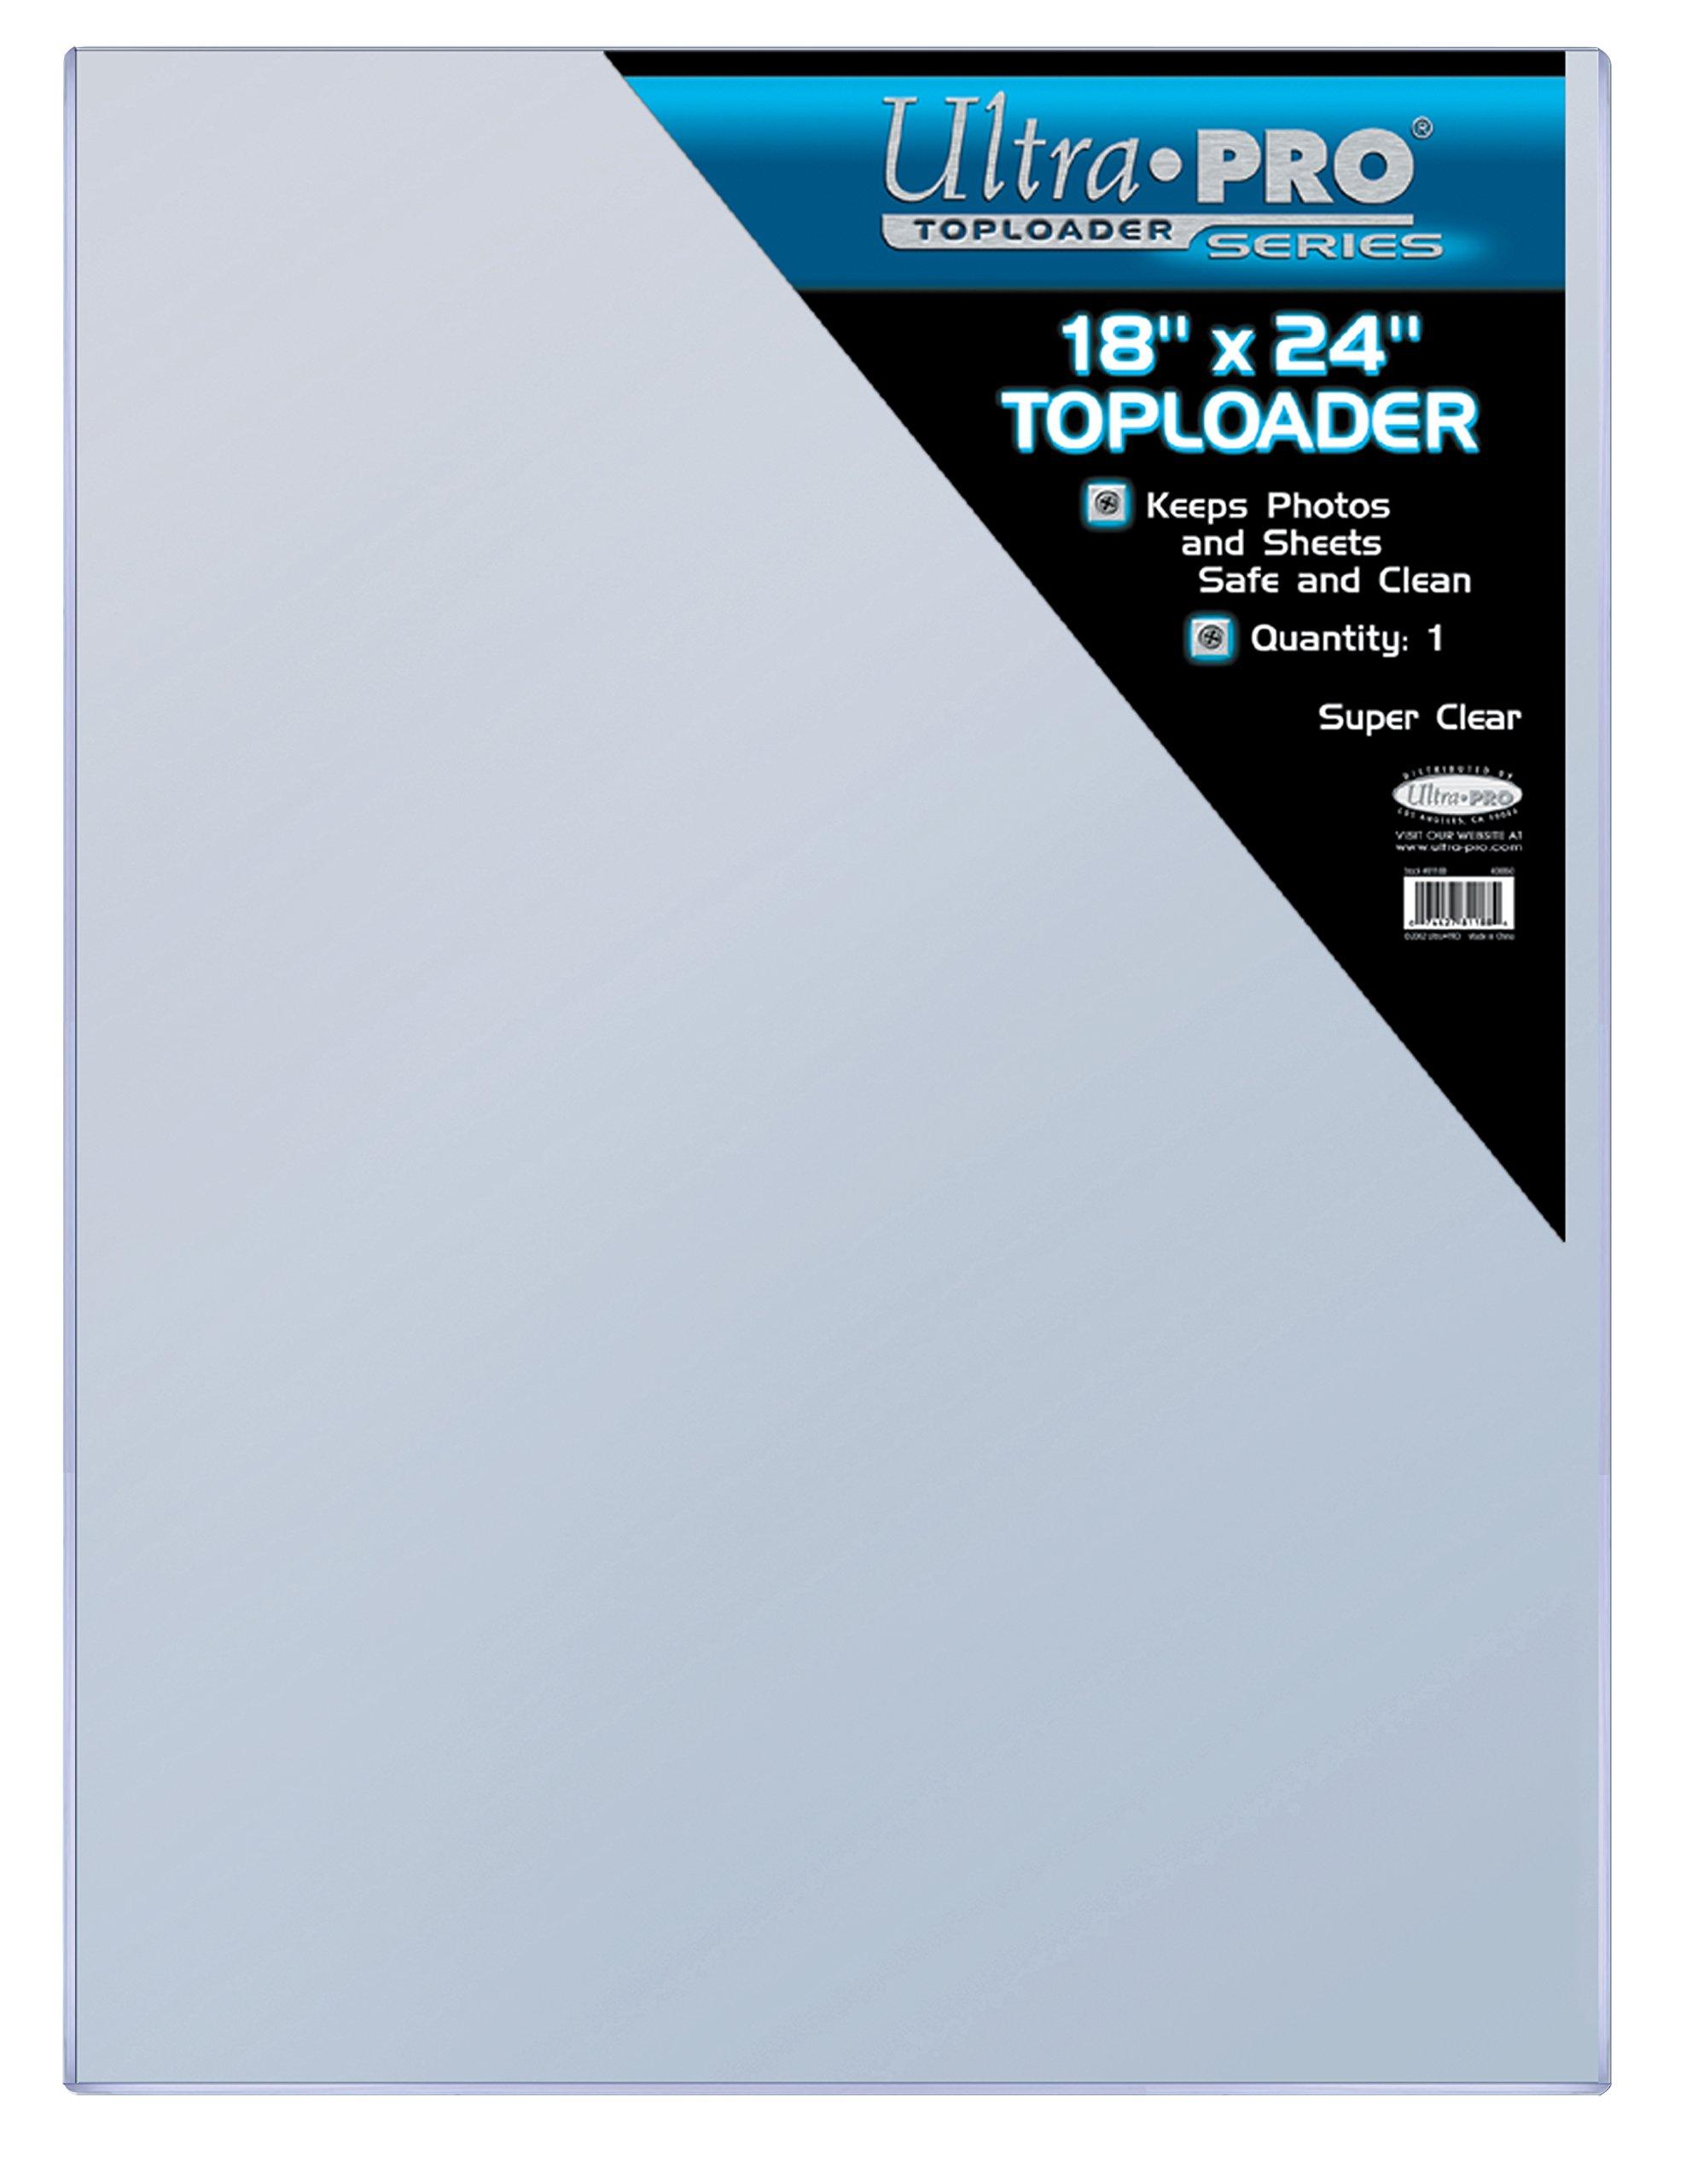 Ultra Pro 18'' X 24'' Toploader